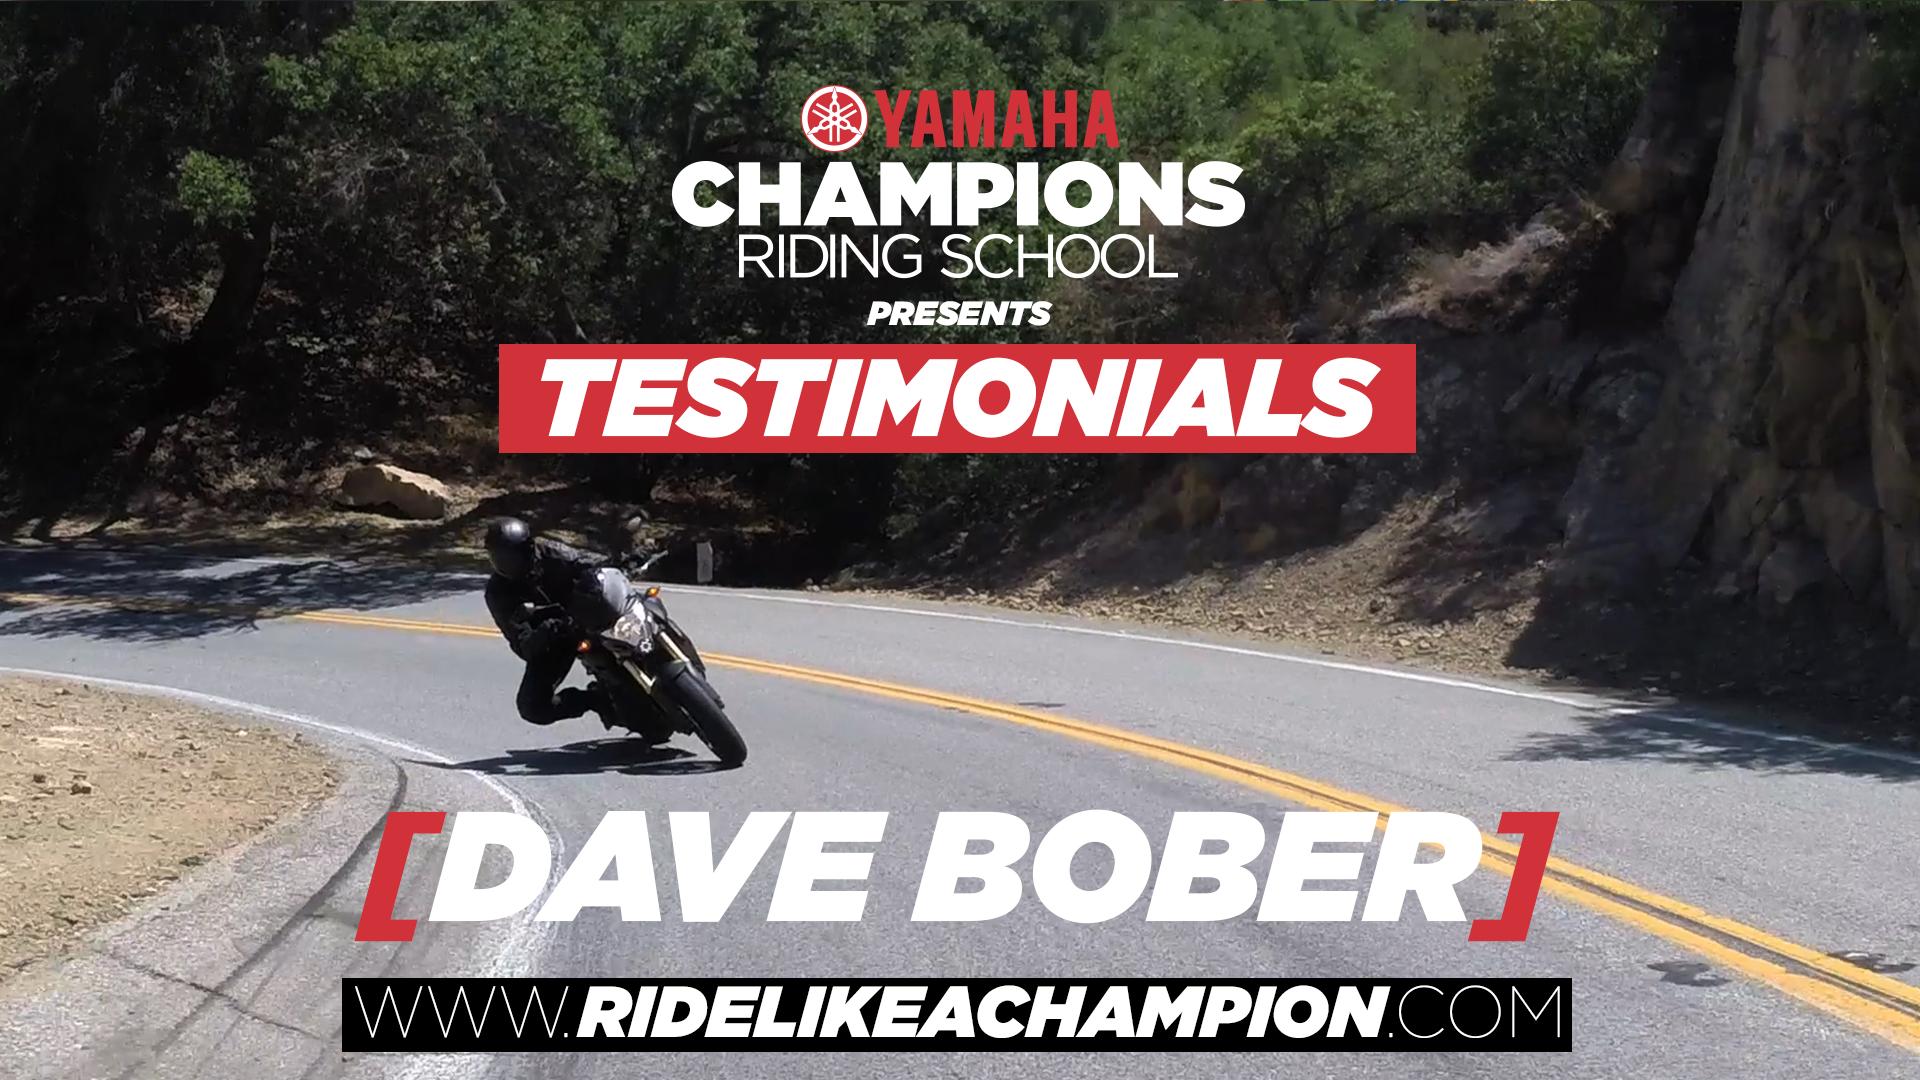 Dave Bober - Yamaha Champions Riding School Testimonial